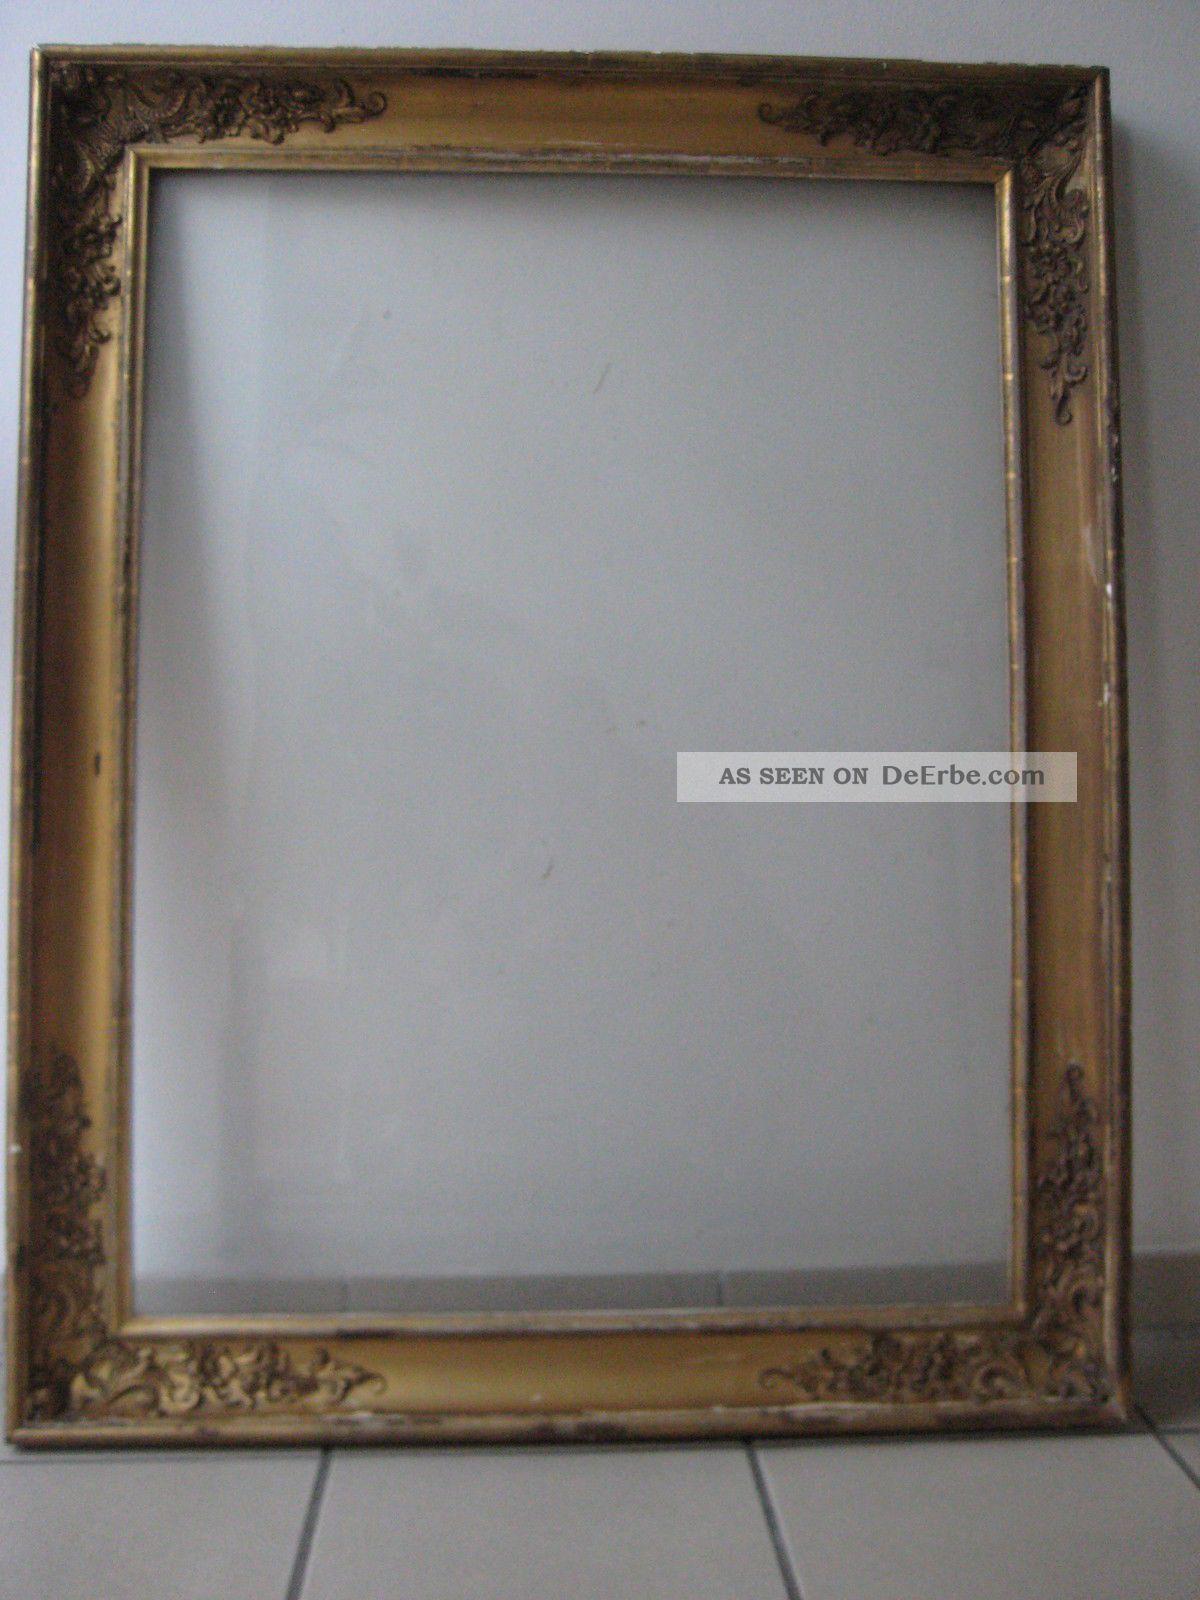 Gr. Klassizismus Gemälde - Rahmen Um 1800, Gratleisten, Holz ...